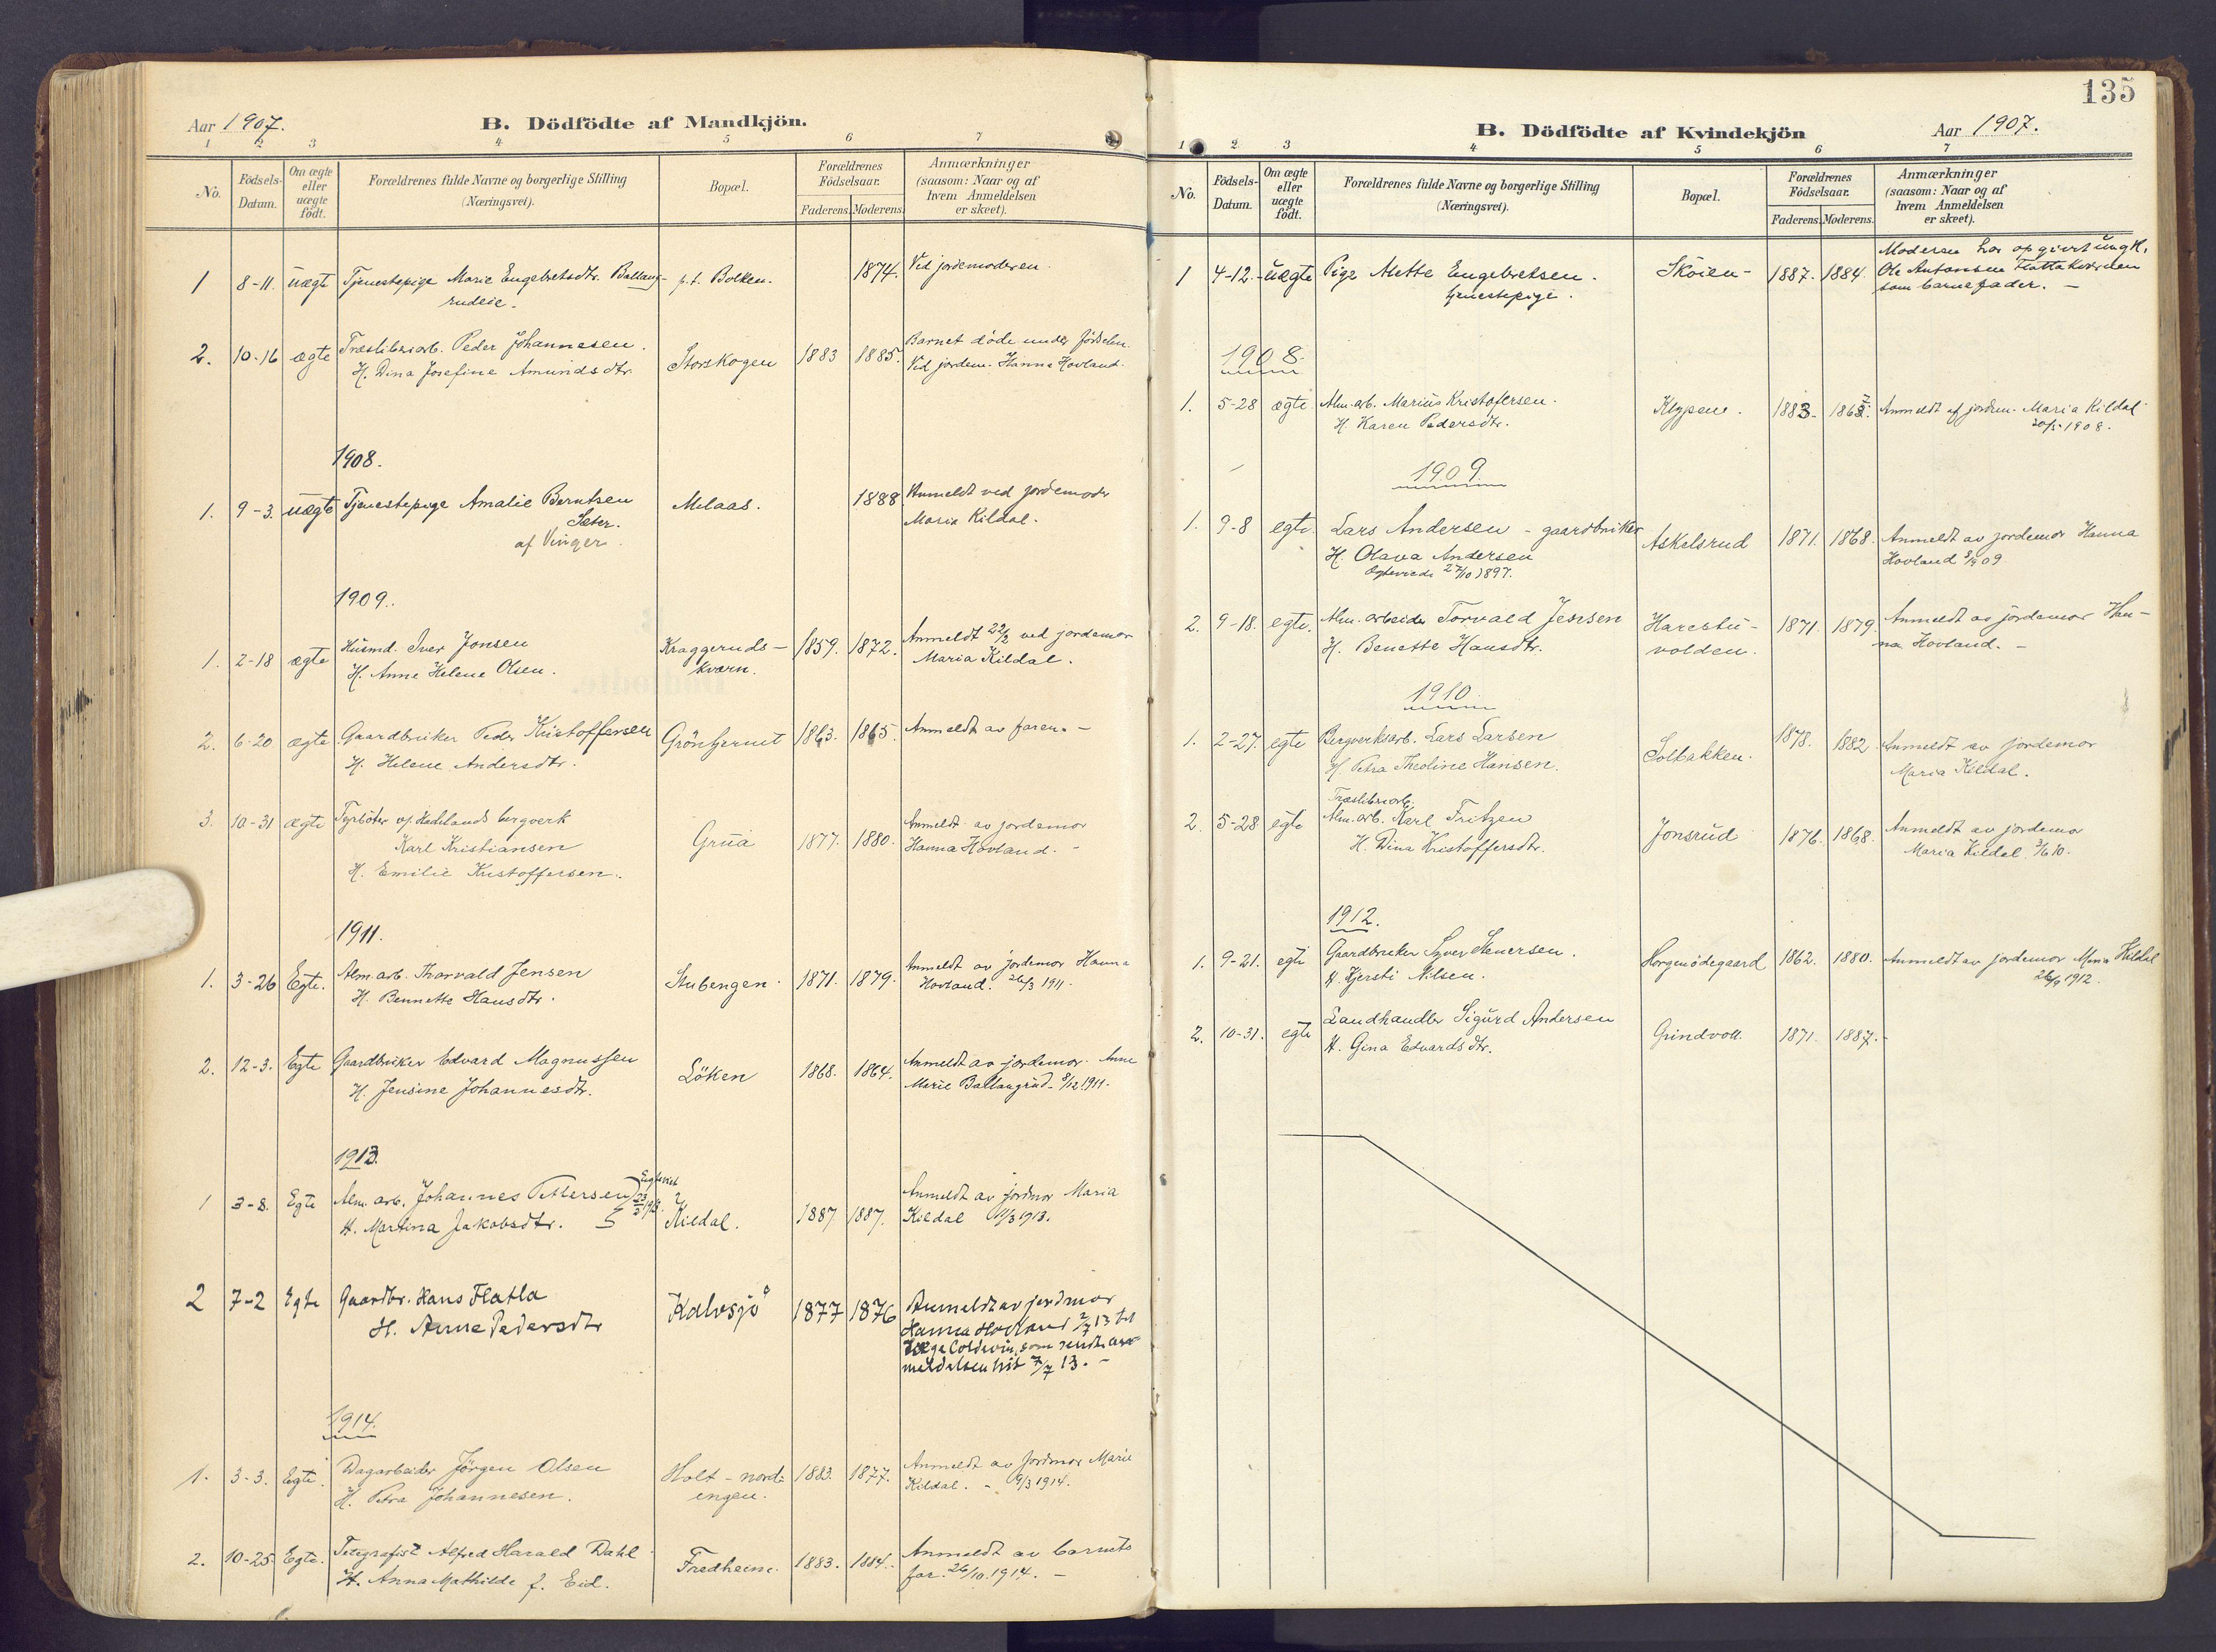 SAH, Lunner prestekontor, H/Ha/Haa/L0001: Ministerialbok nr. 1, 1907-1922, s. 135